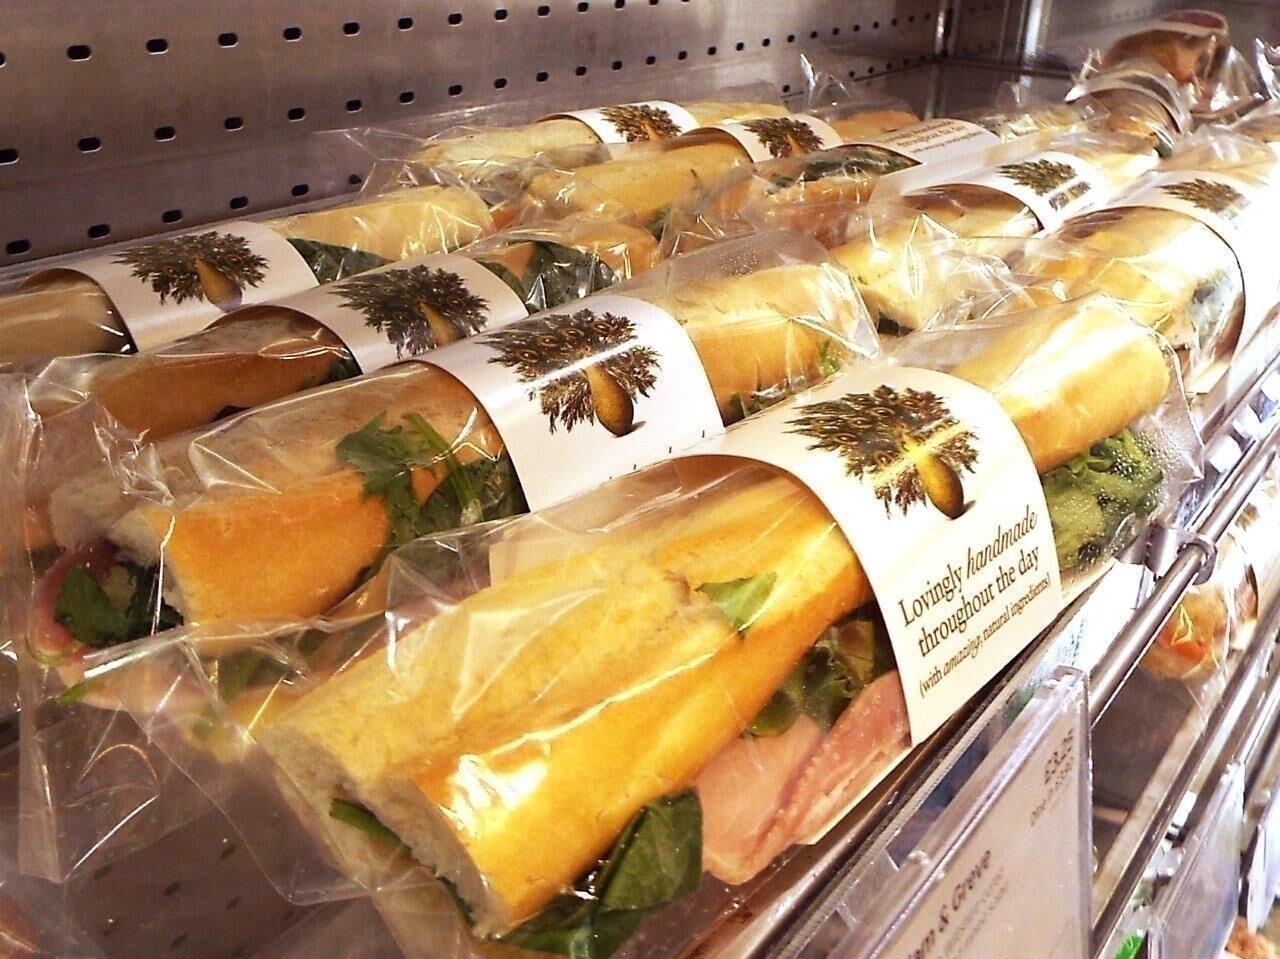 PRET A MANGER posh cheddar pickle mini-baguette